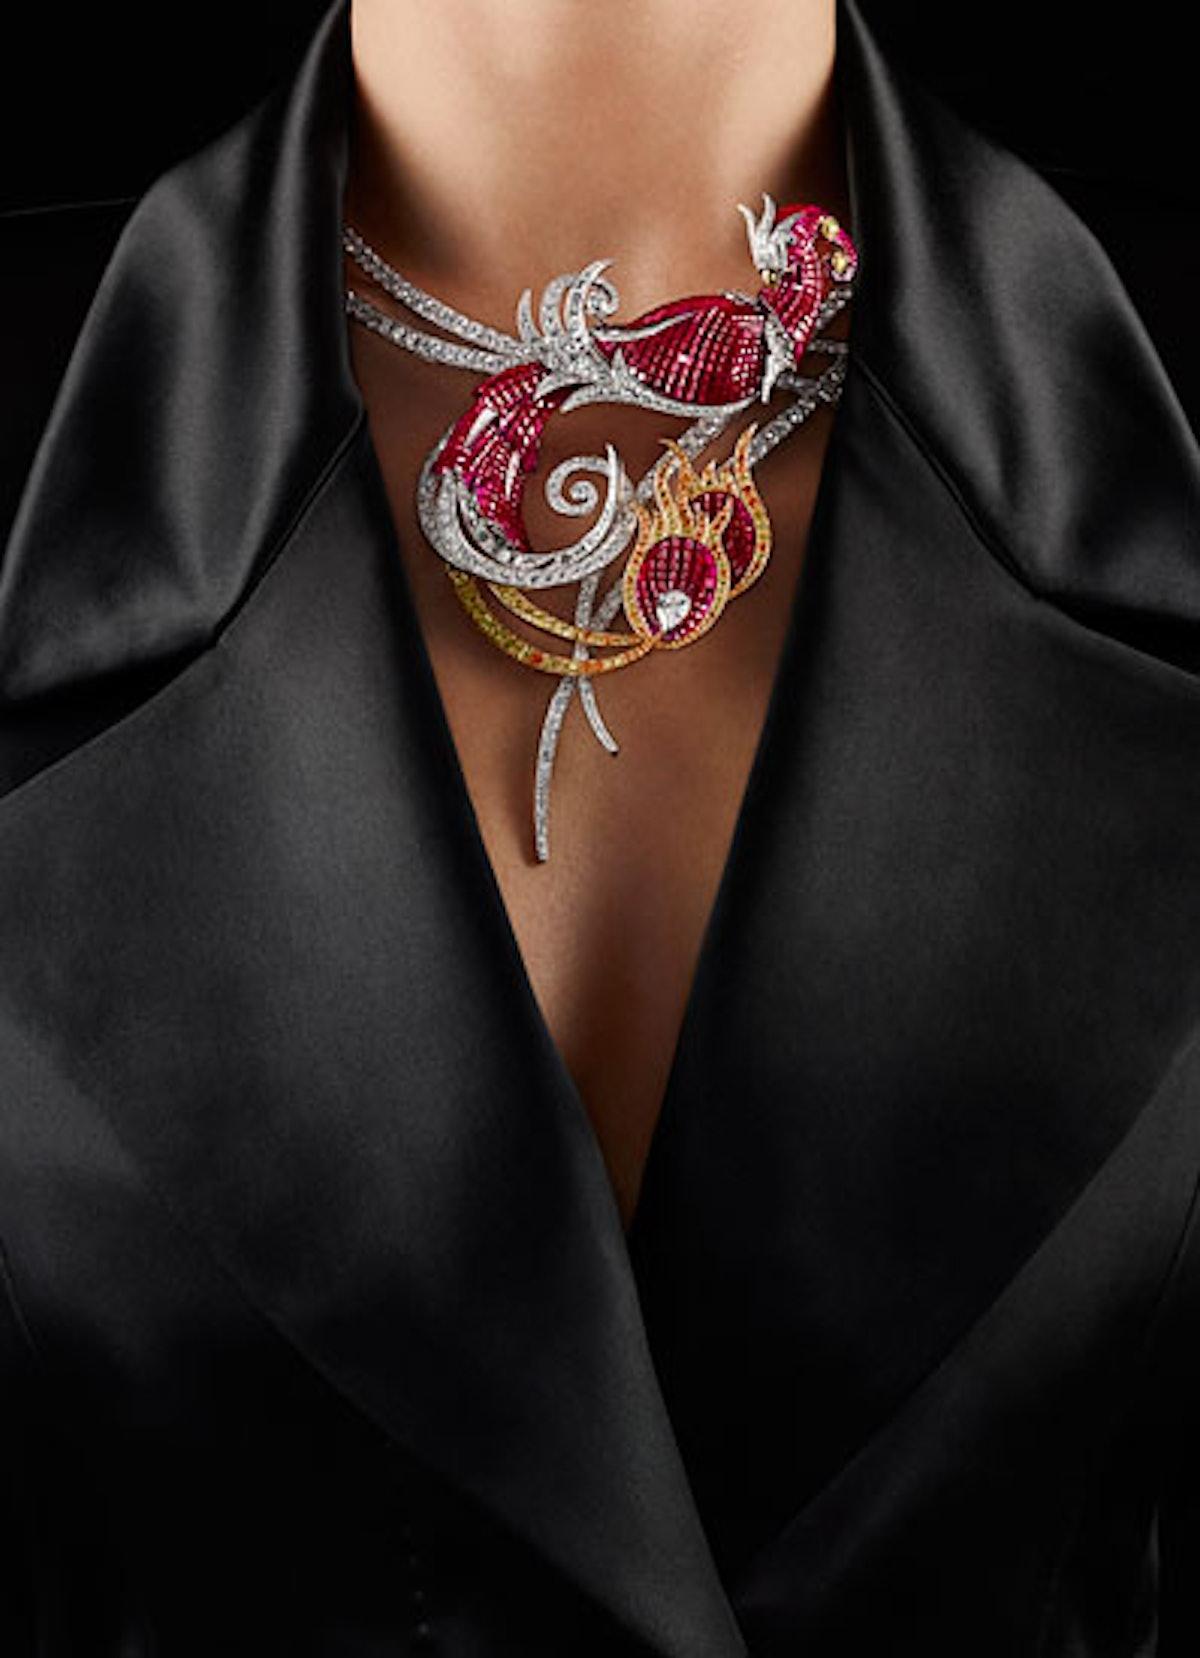 acss-decades-costume-jewelry-20-v.jpg